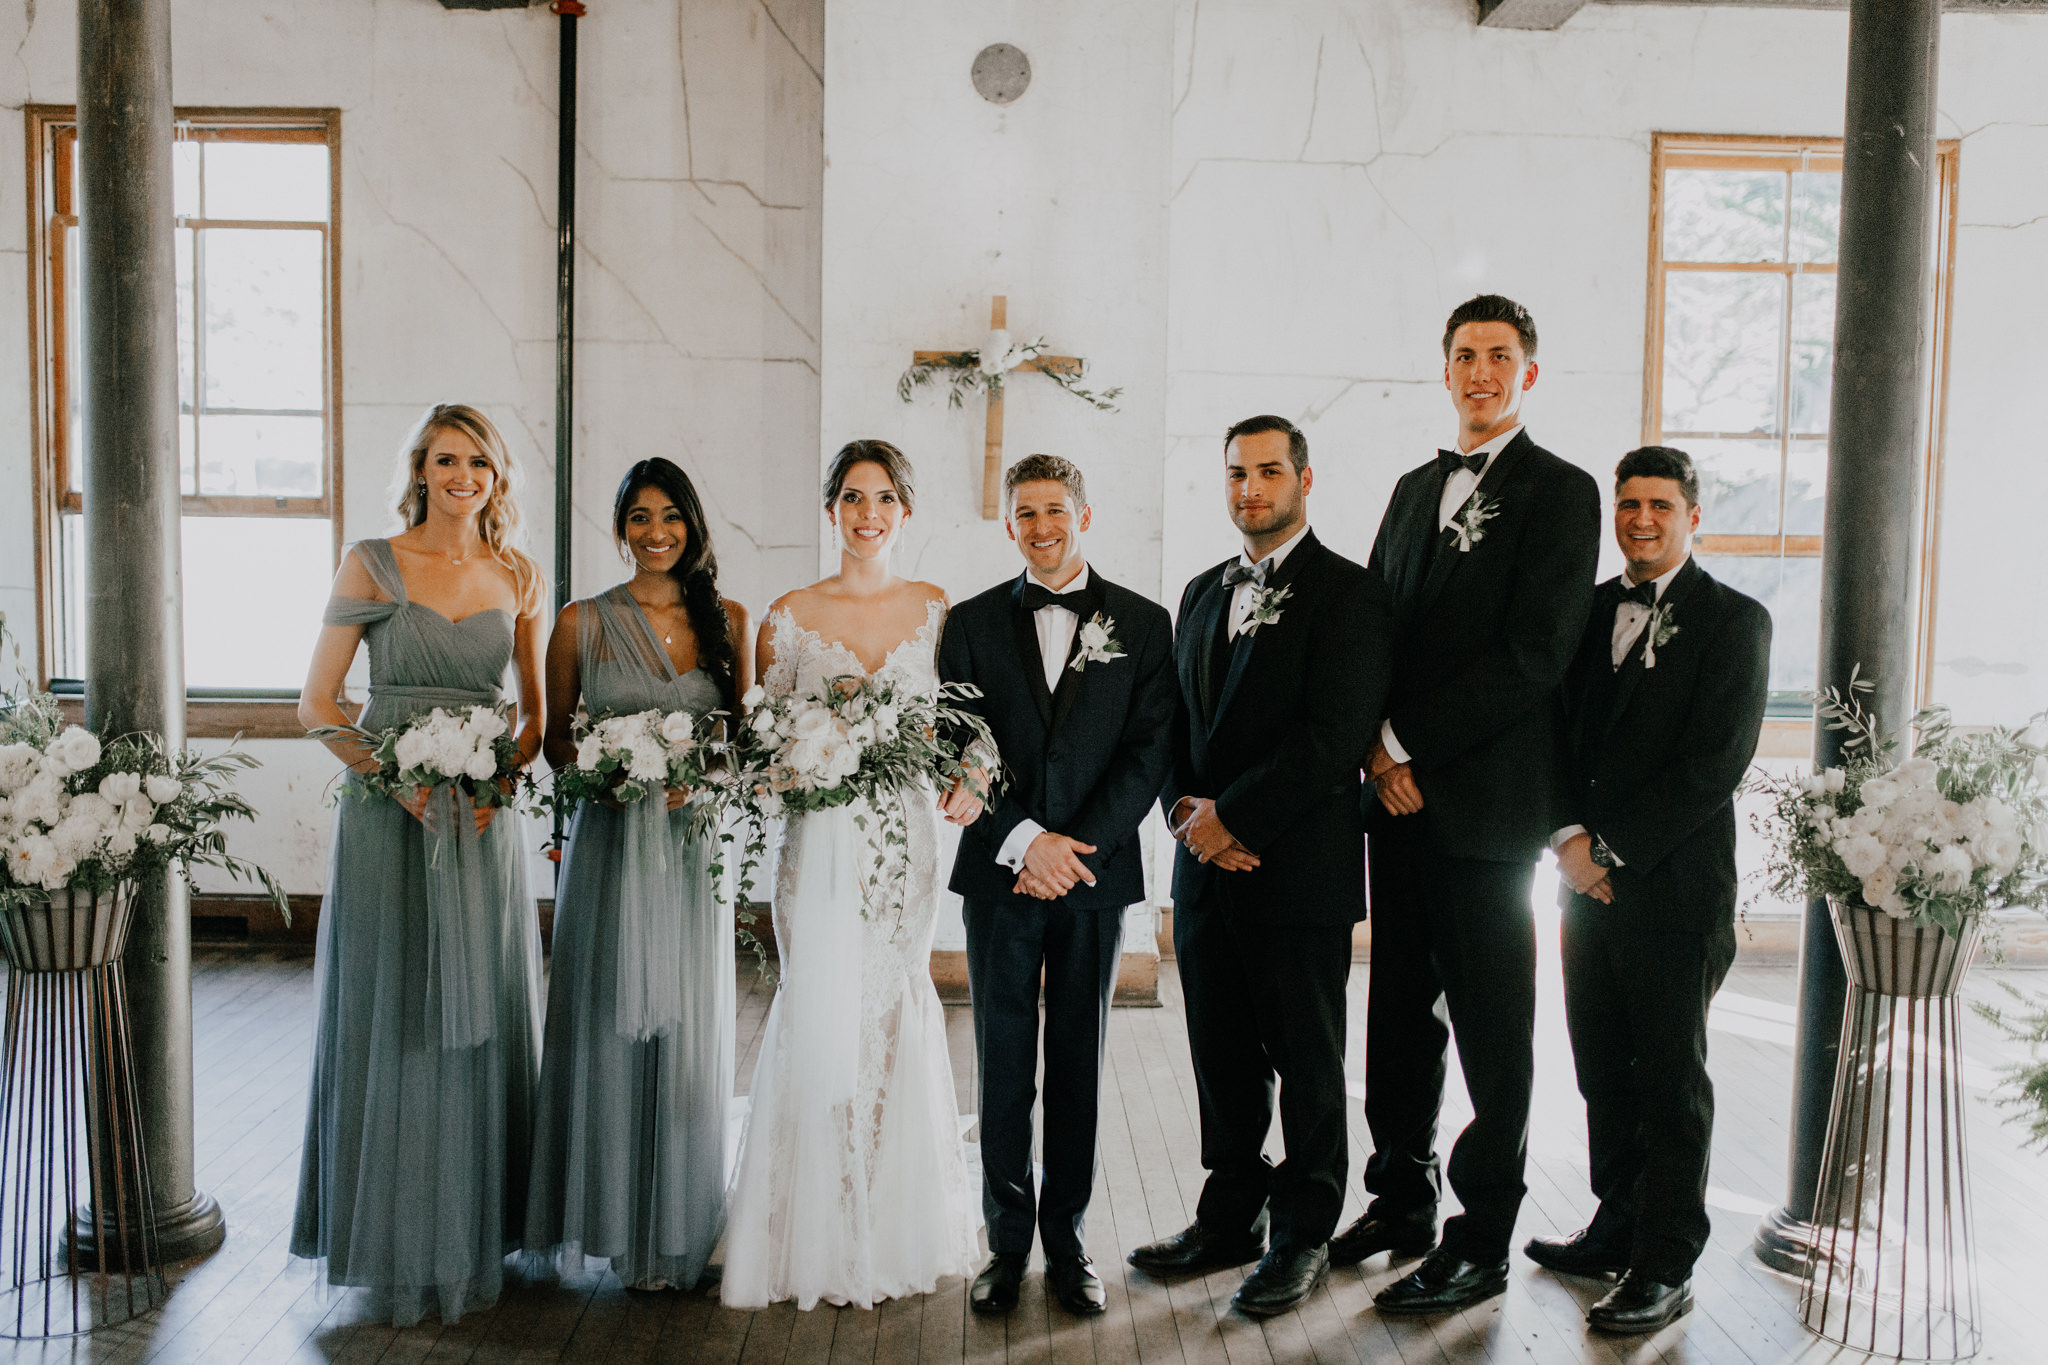 wedding-headlands-center-for-the-arts-sausalito-94.jpg